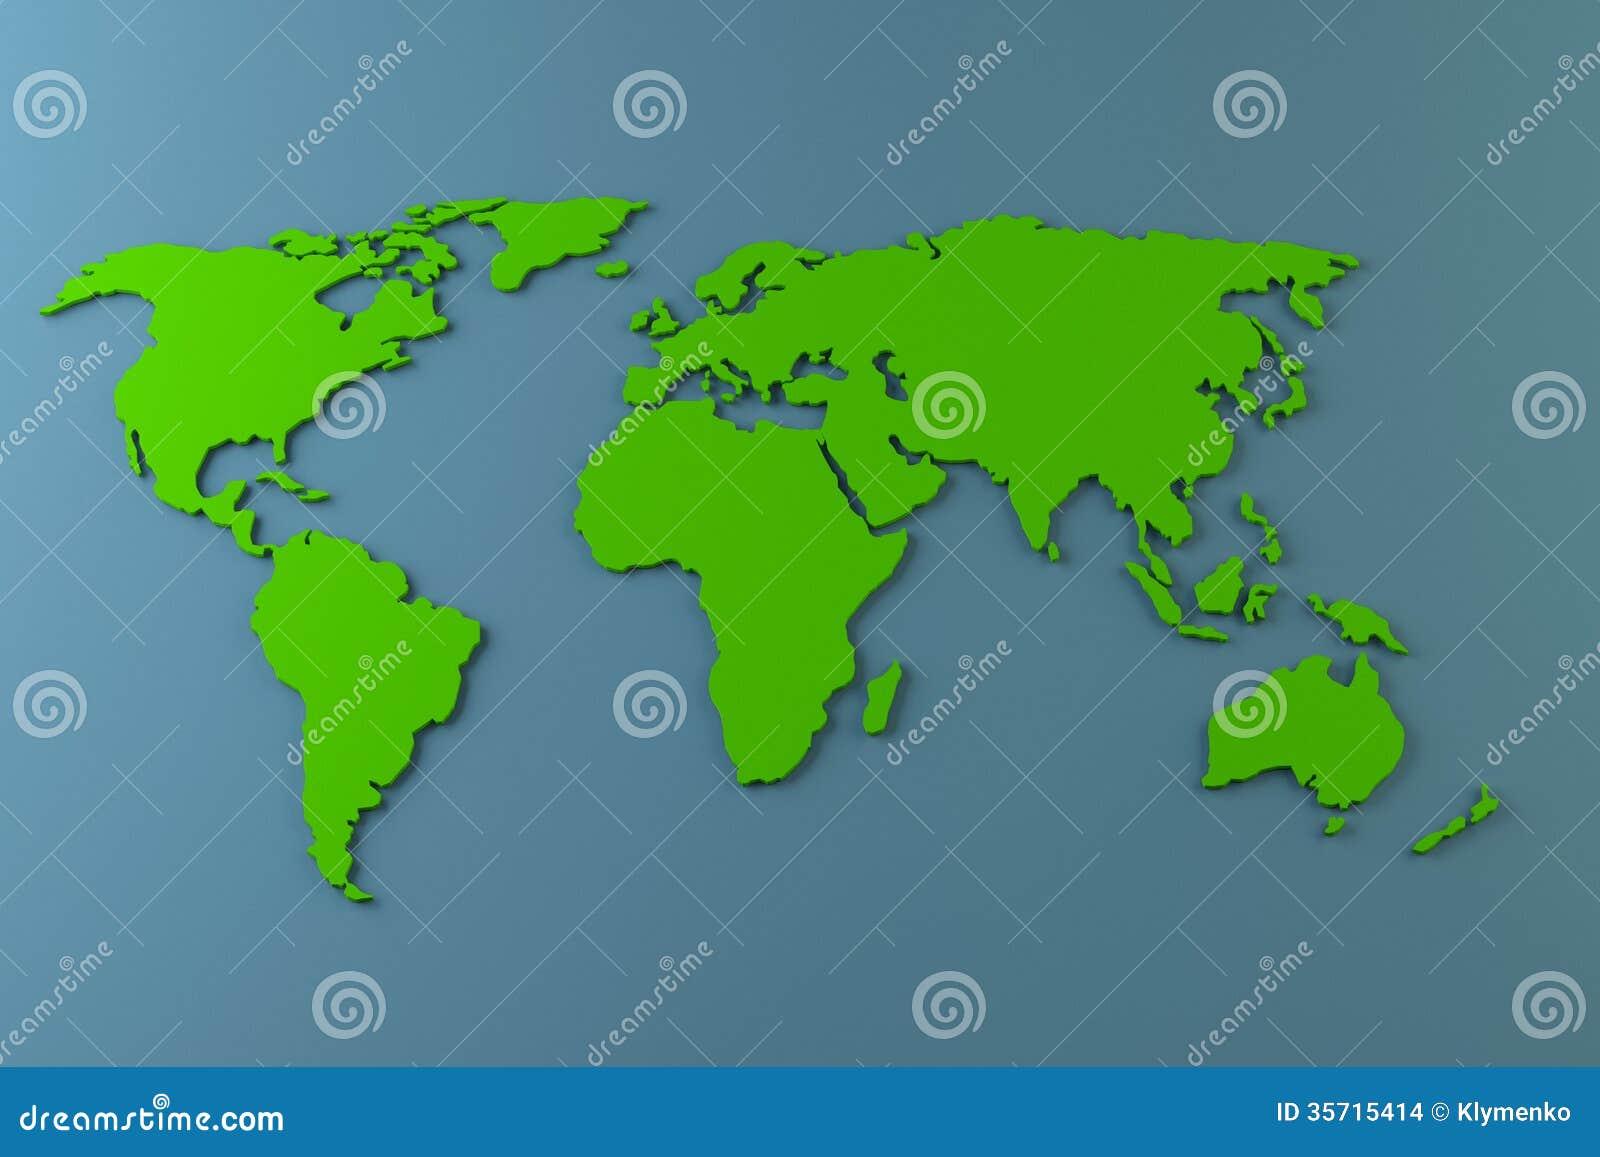 world map plain